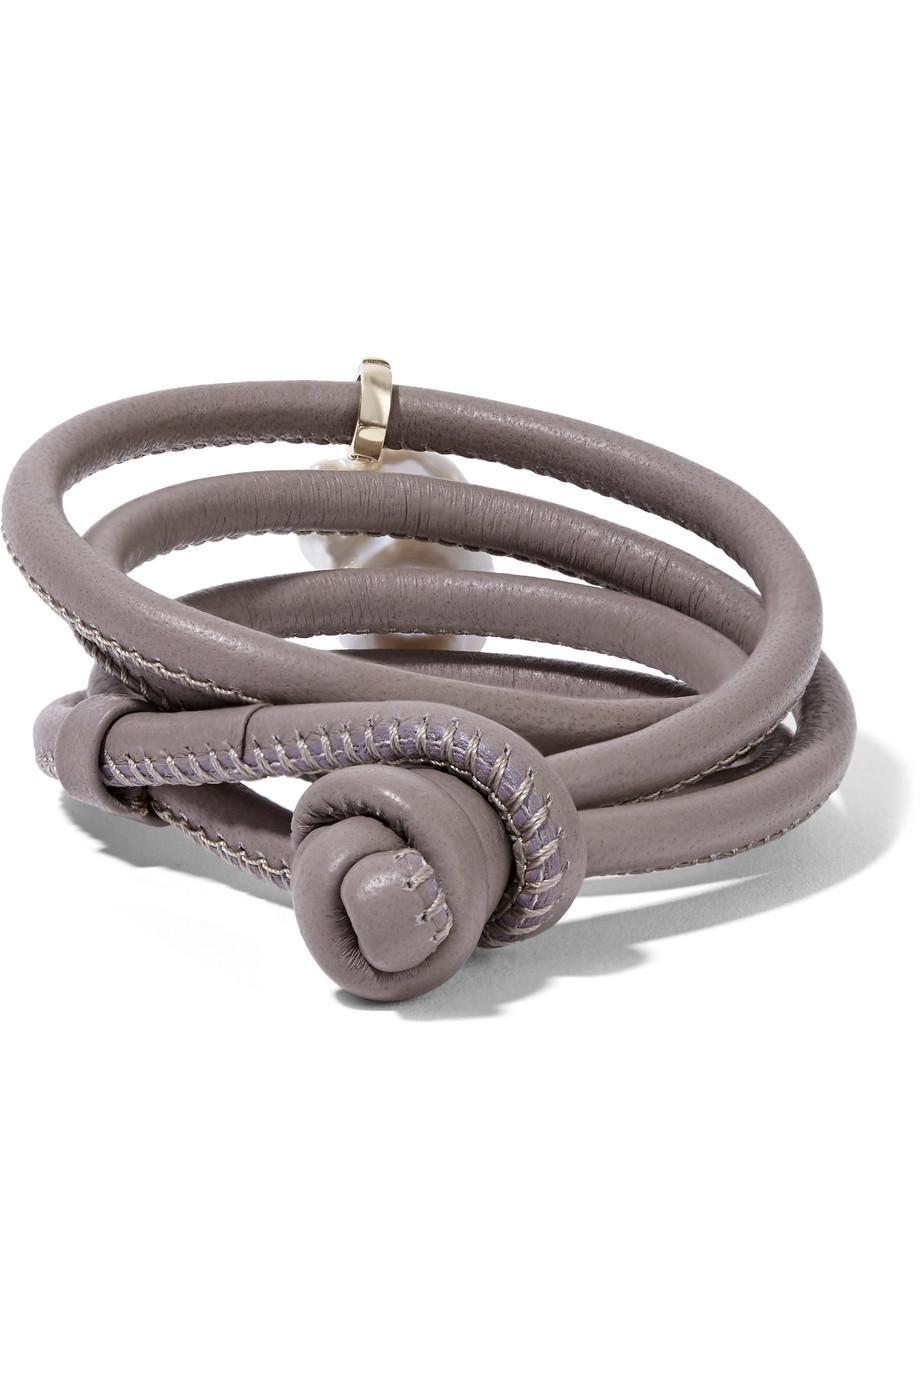 14-karat Gold, Leather And Pearl Wrap Bracelet - Gray Mizuki